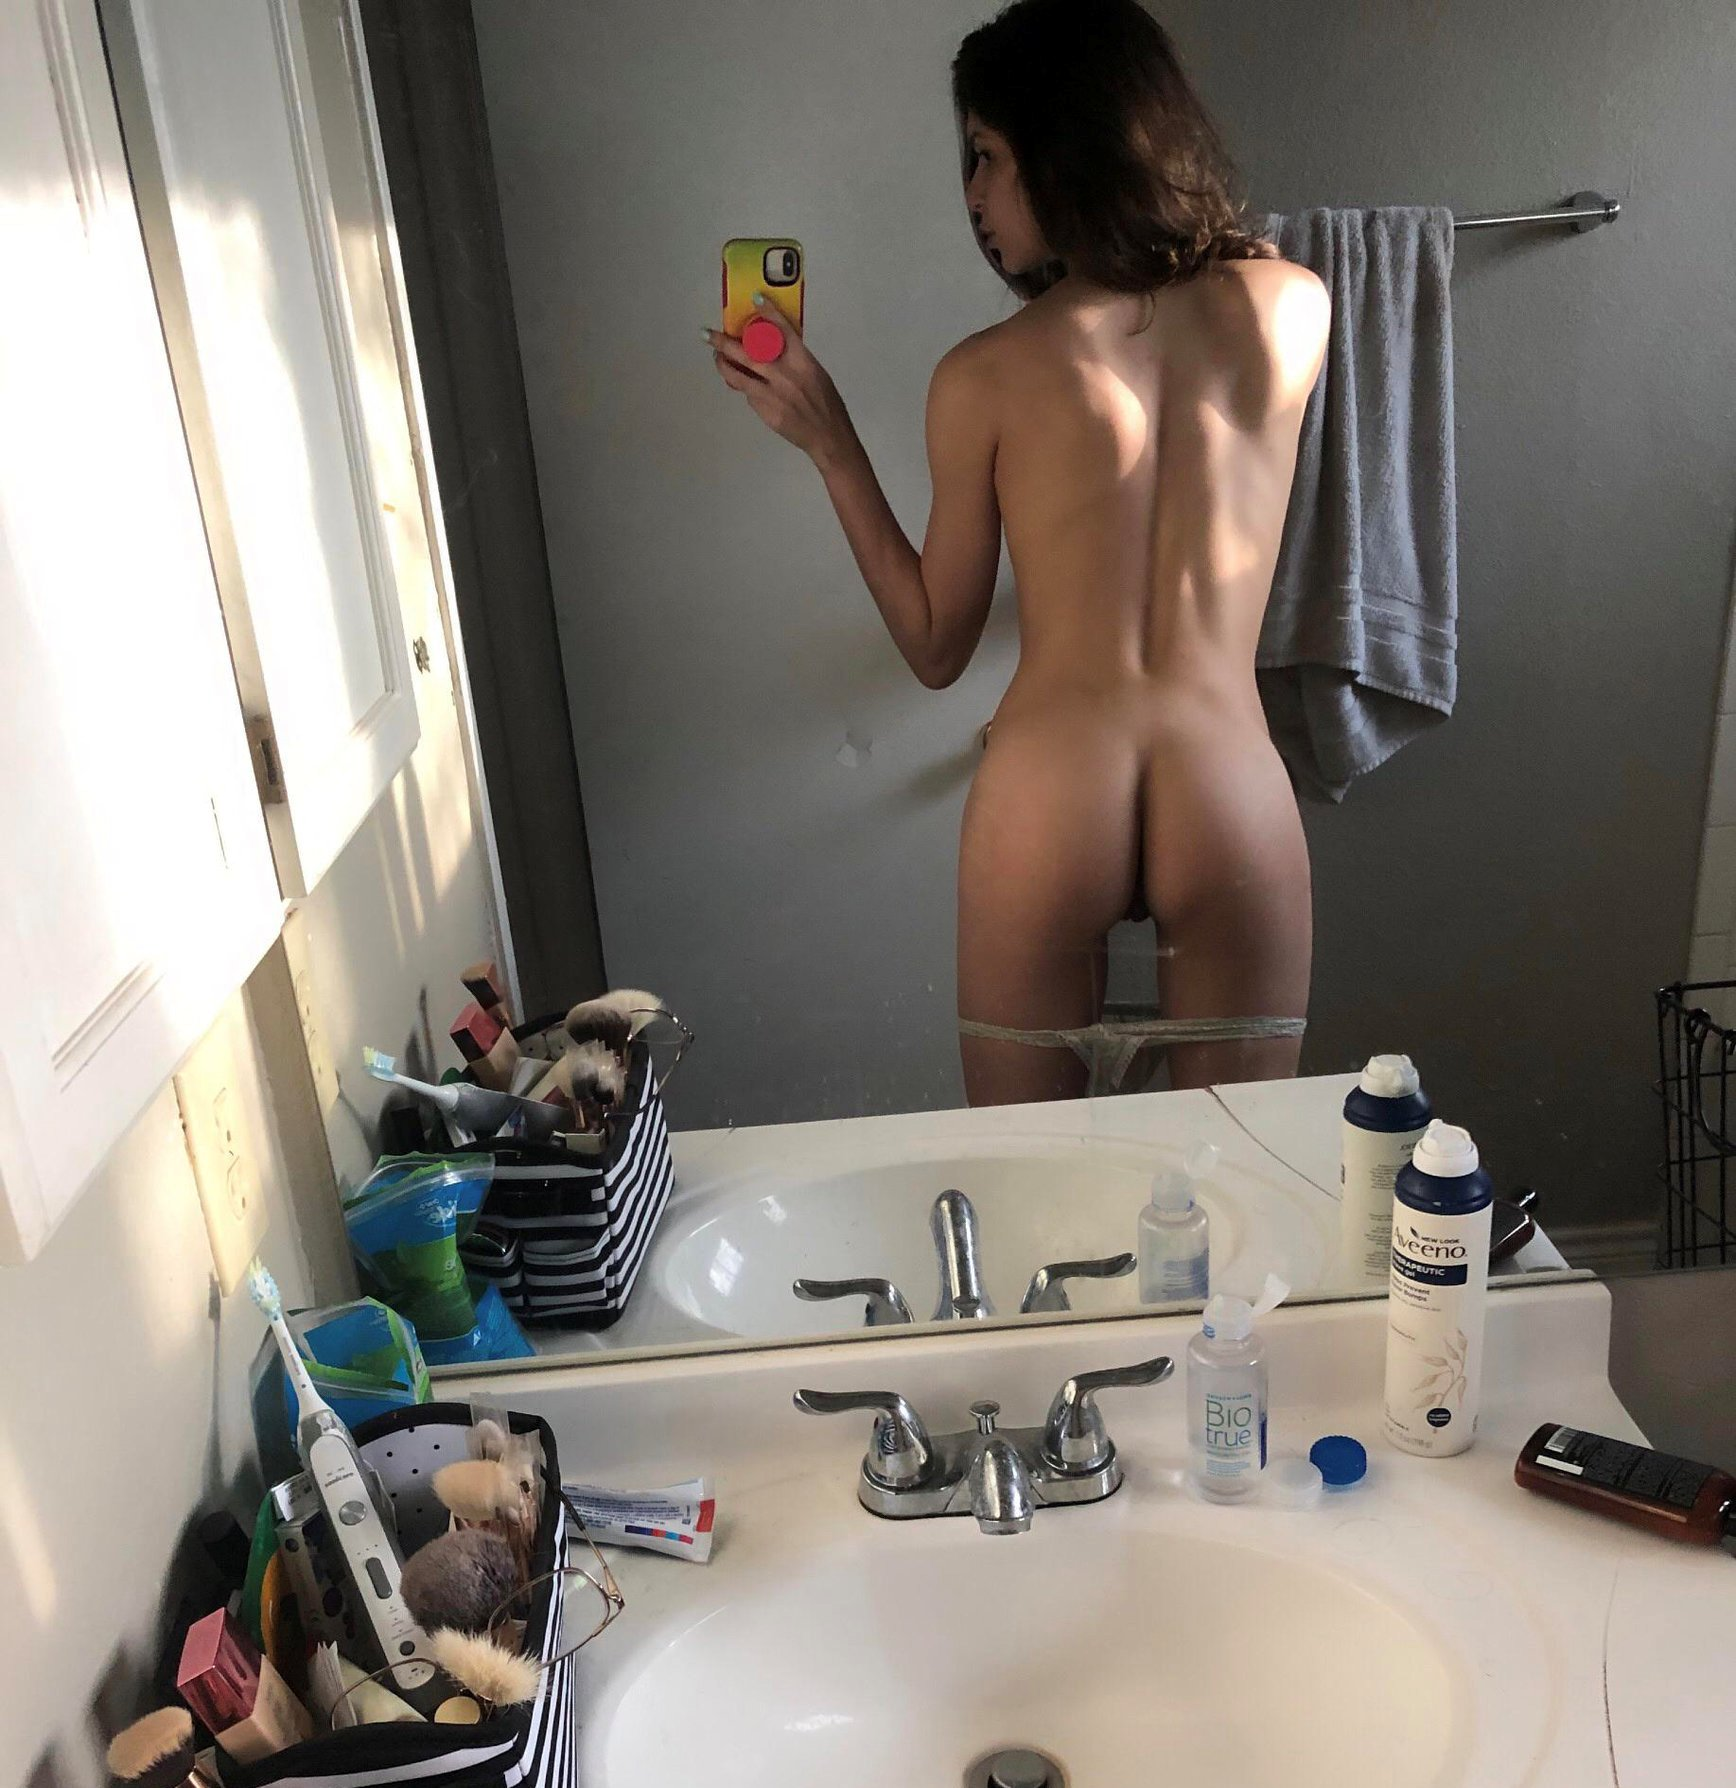 Hornyprogrammer Onlyfans Nude Leaks 0006